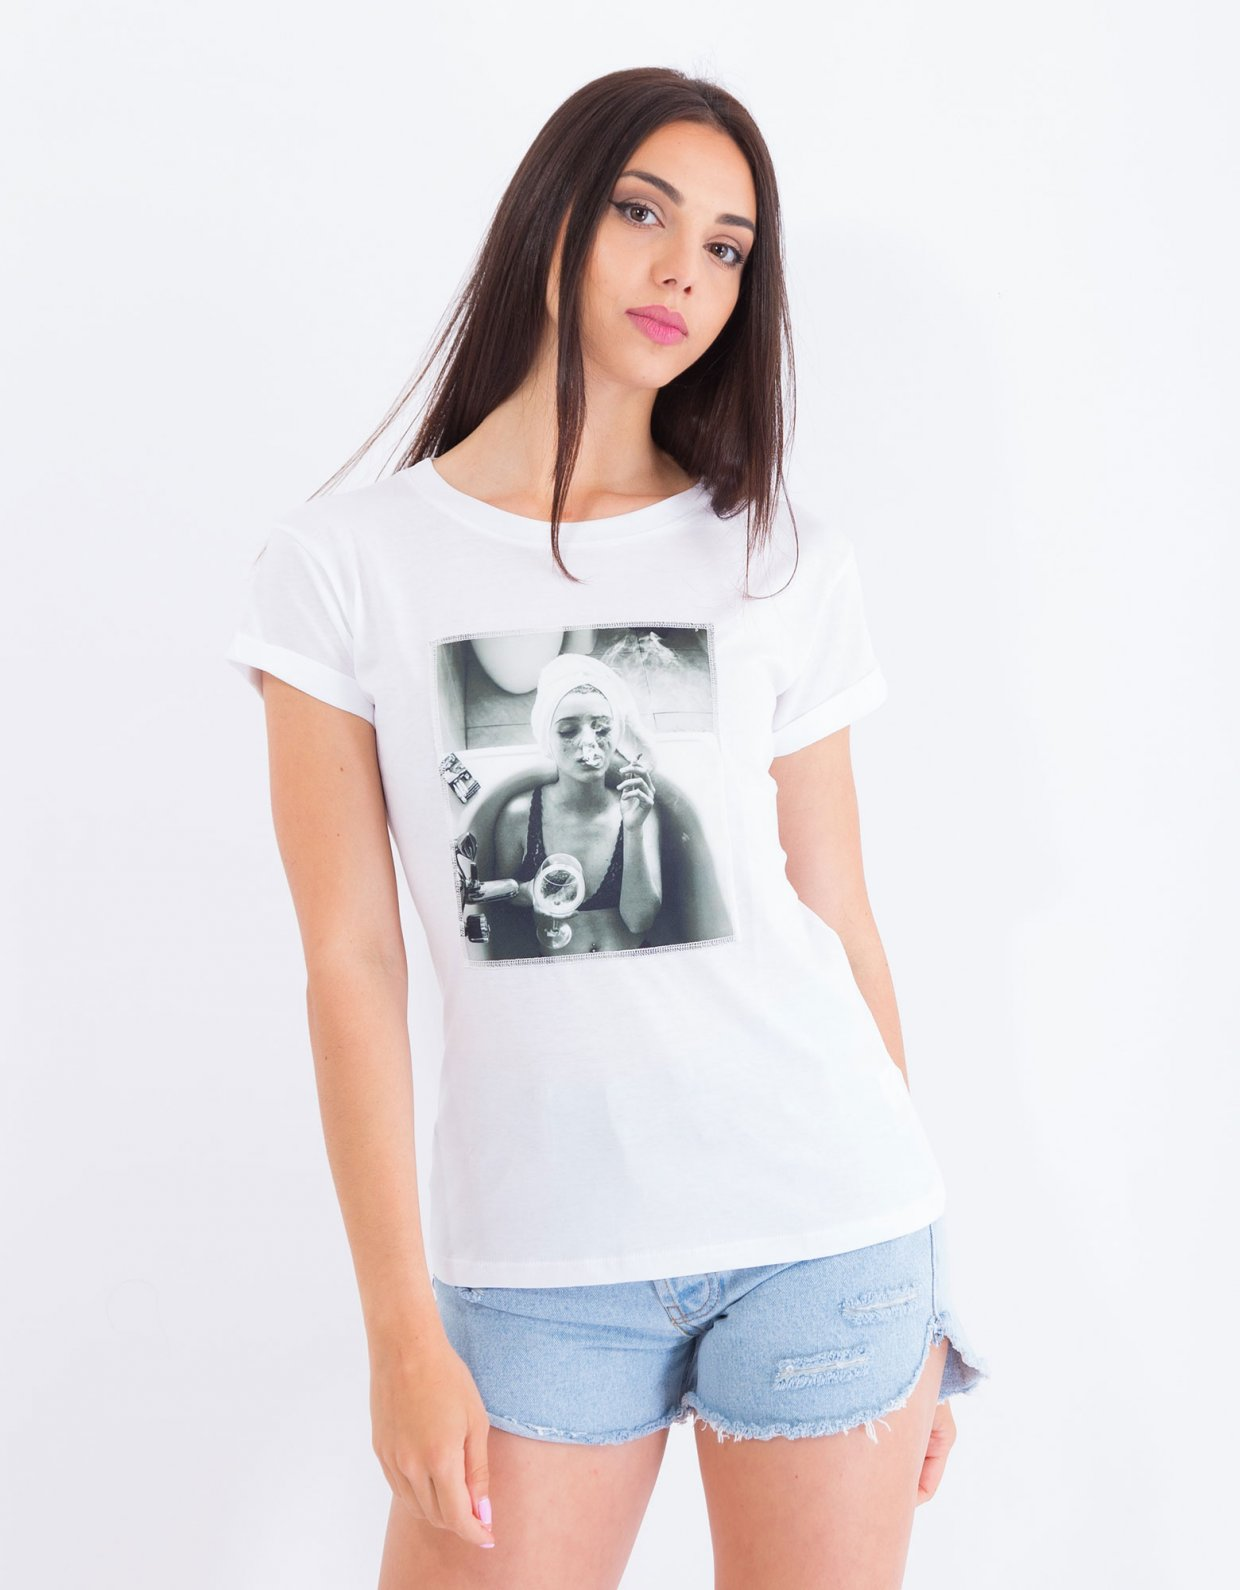 Ripped Cotton Bath tub t-shirt